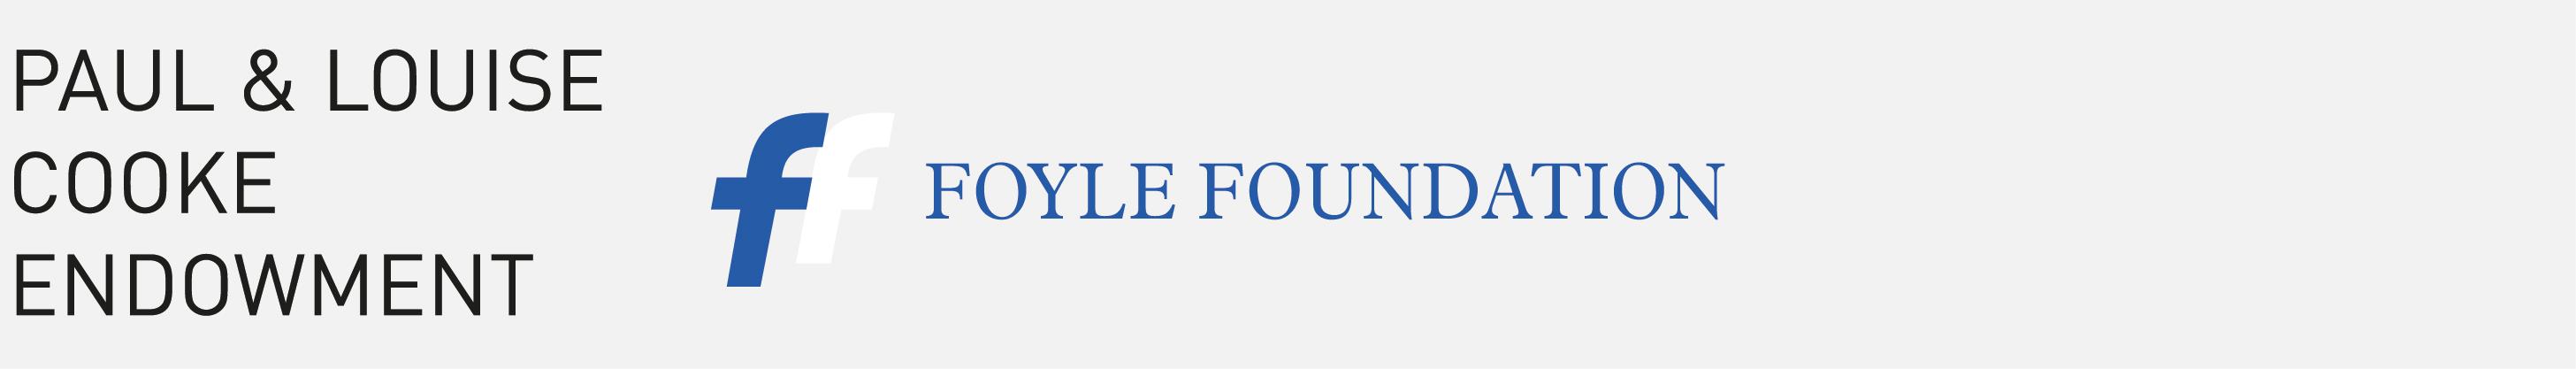 Paul and Louise Cooke Endowment Ltd.